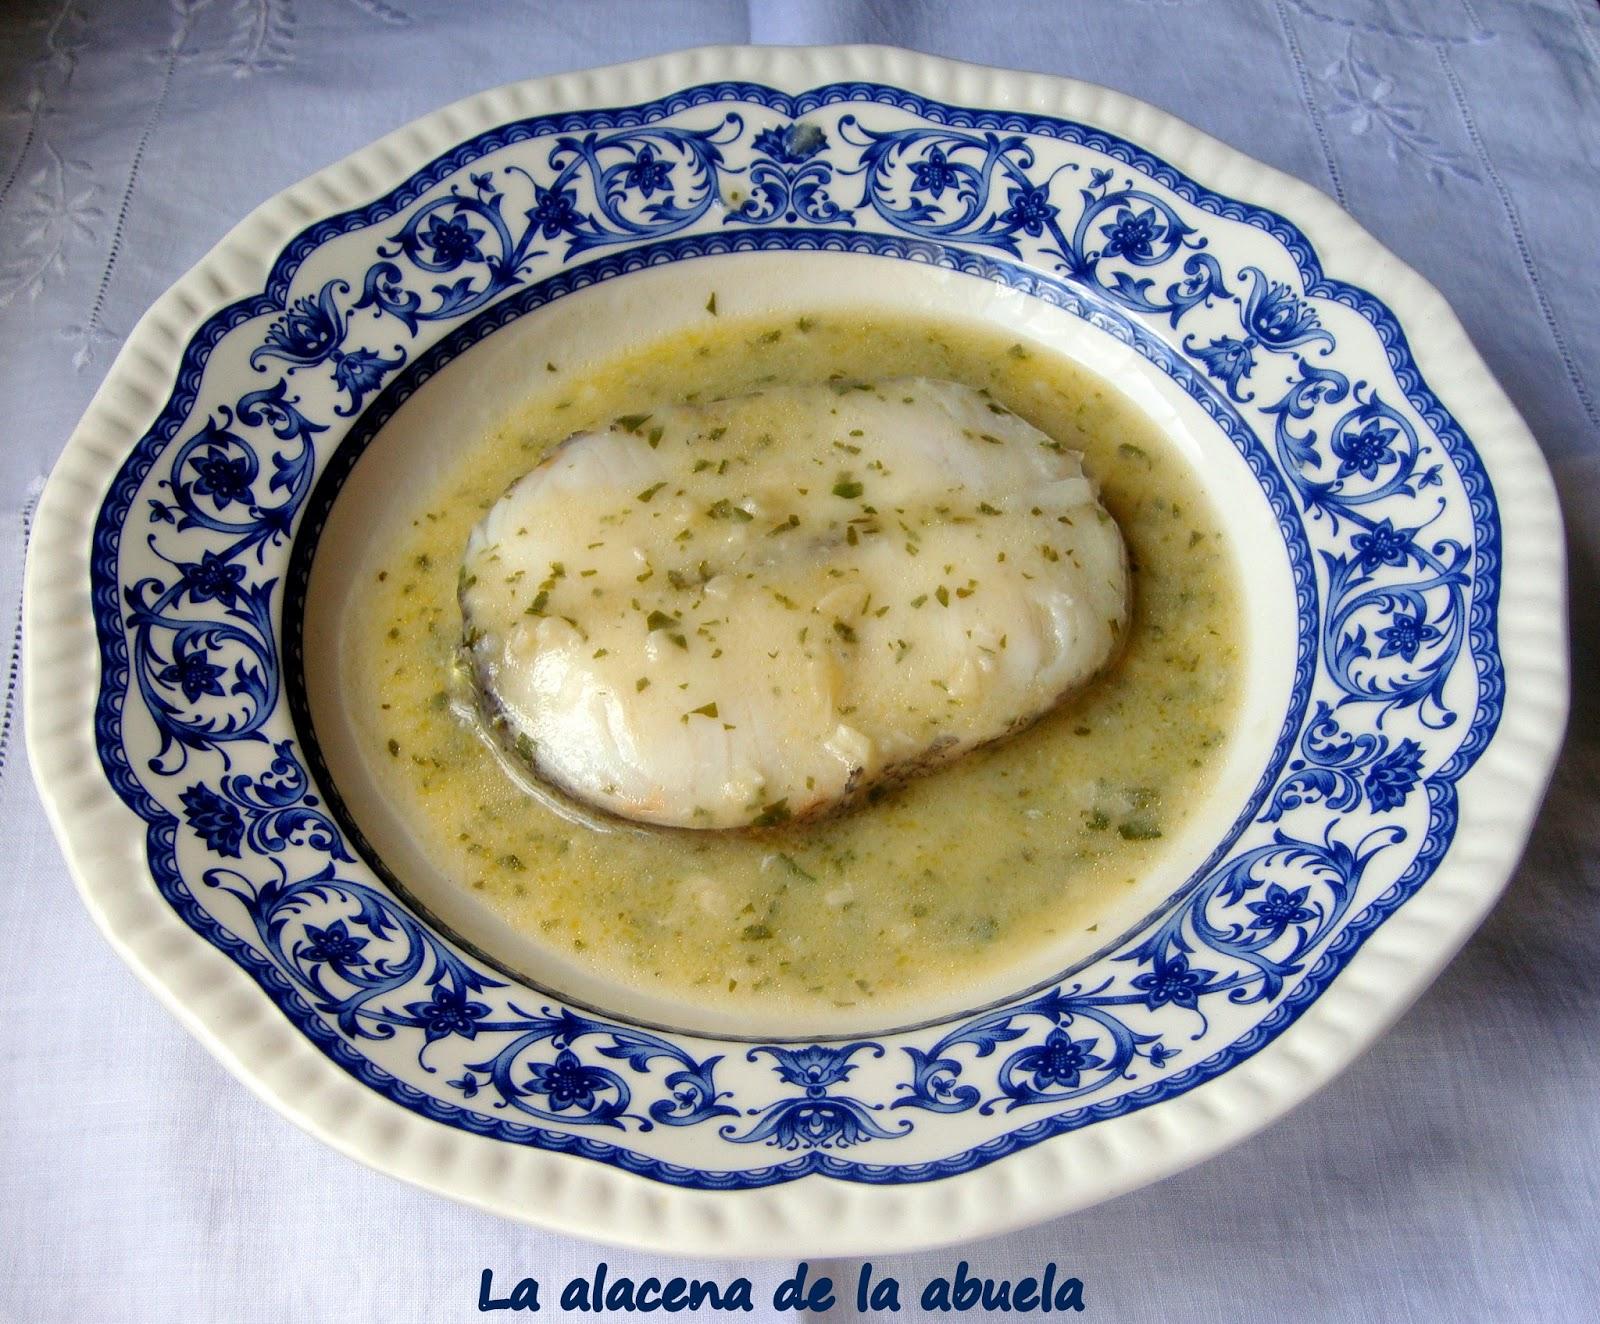 La alacena de la abuela carmen merluza en salsa verde for Cocina casera de la abuela